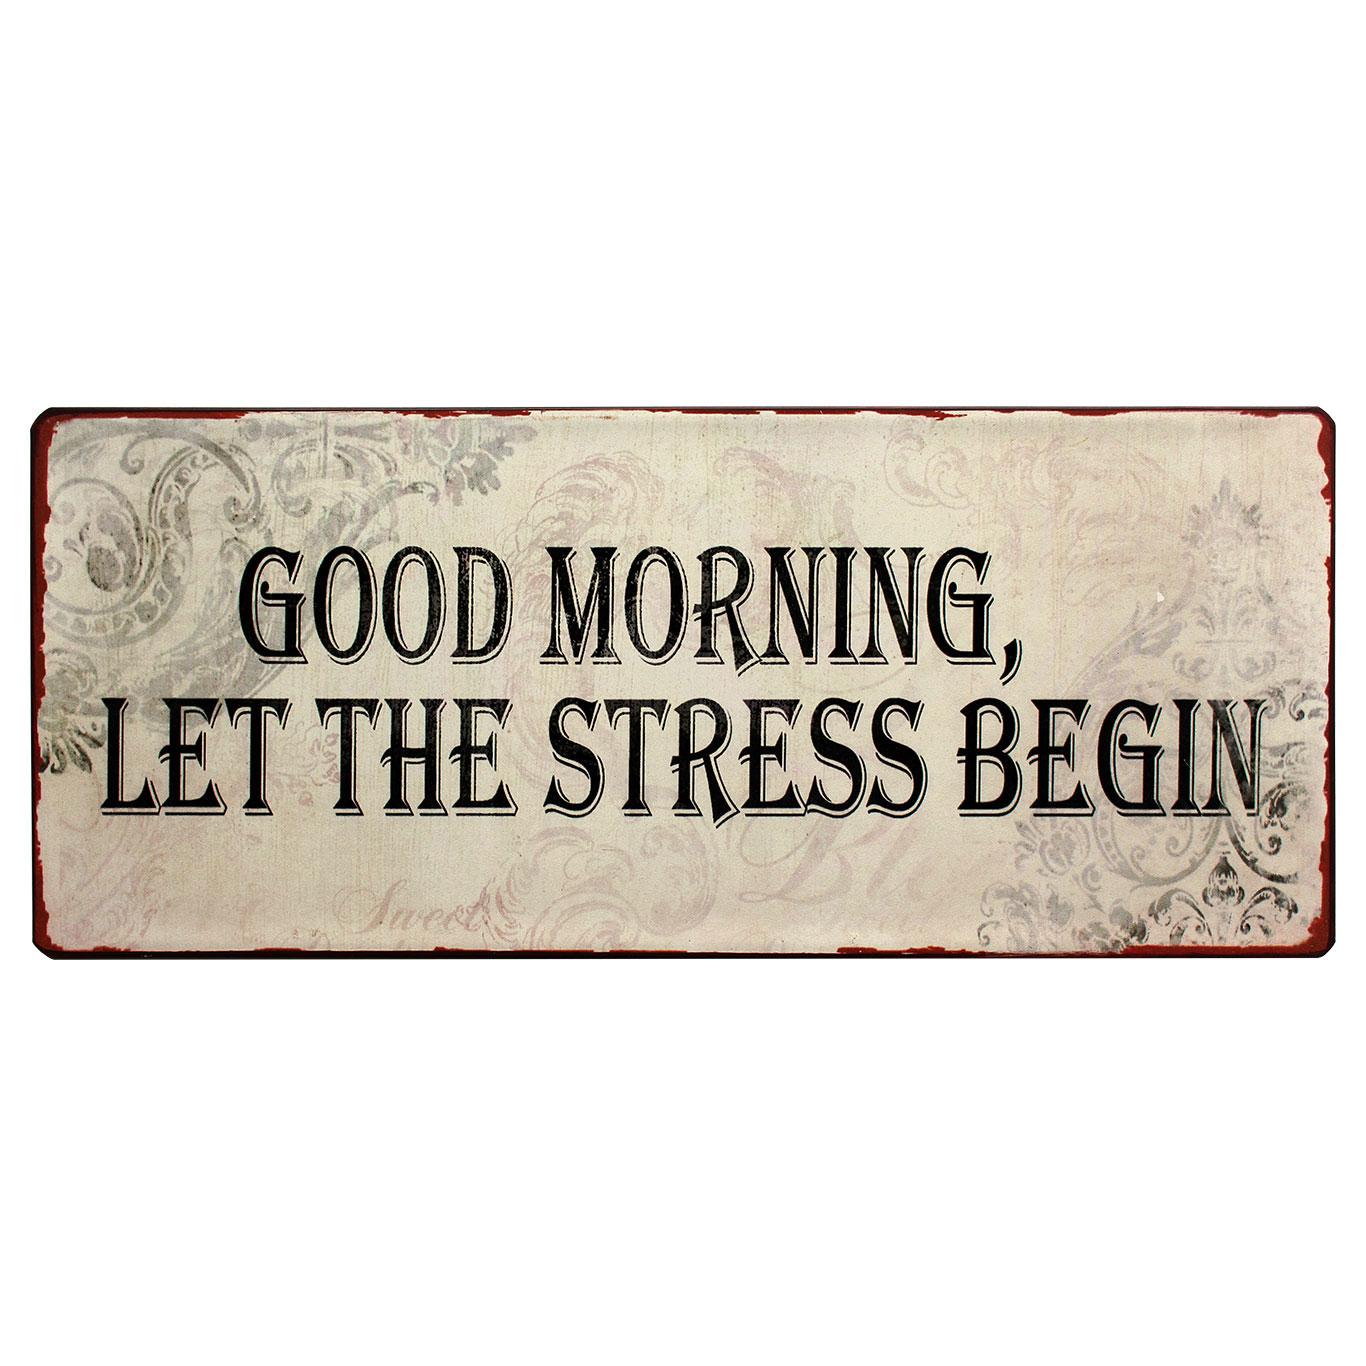 N em1369 good morning let the tress begin spreukenbord tekstbord uitspraken gezegde spreuken rustiek bord cadeau